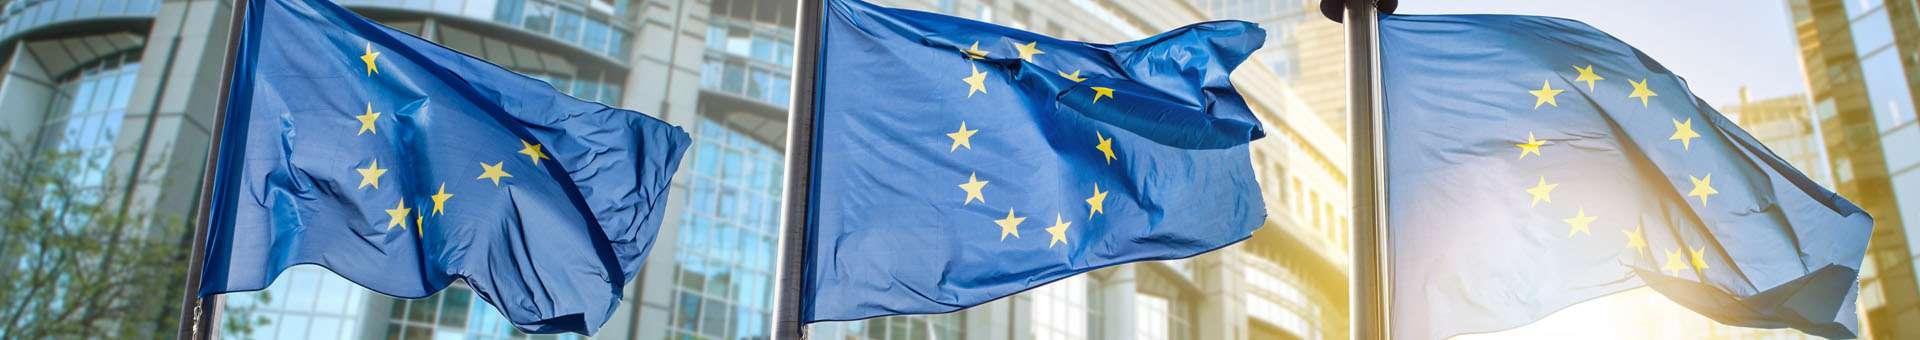 Búsqueda de información Whois de nombres de dominios en EU